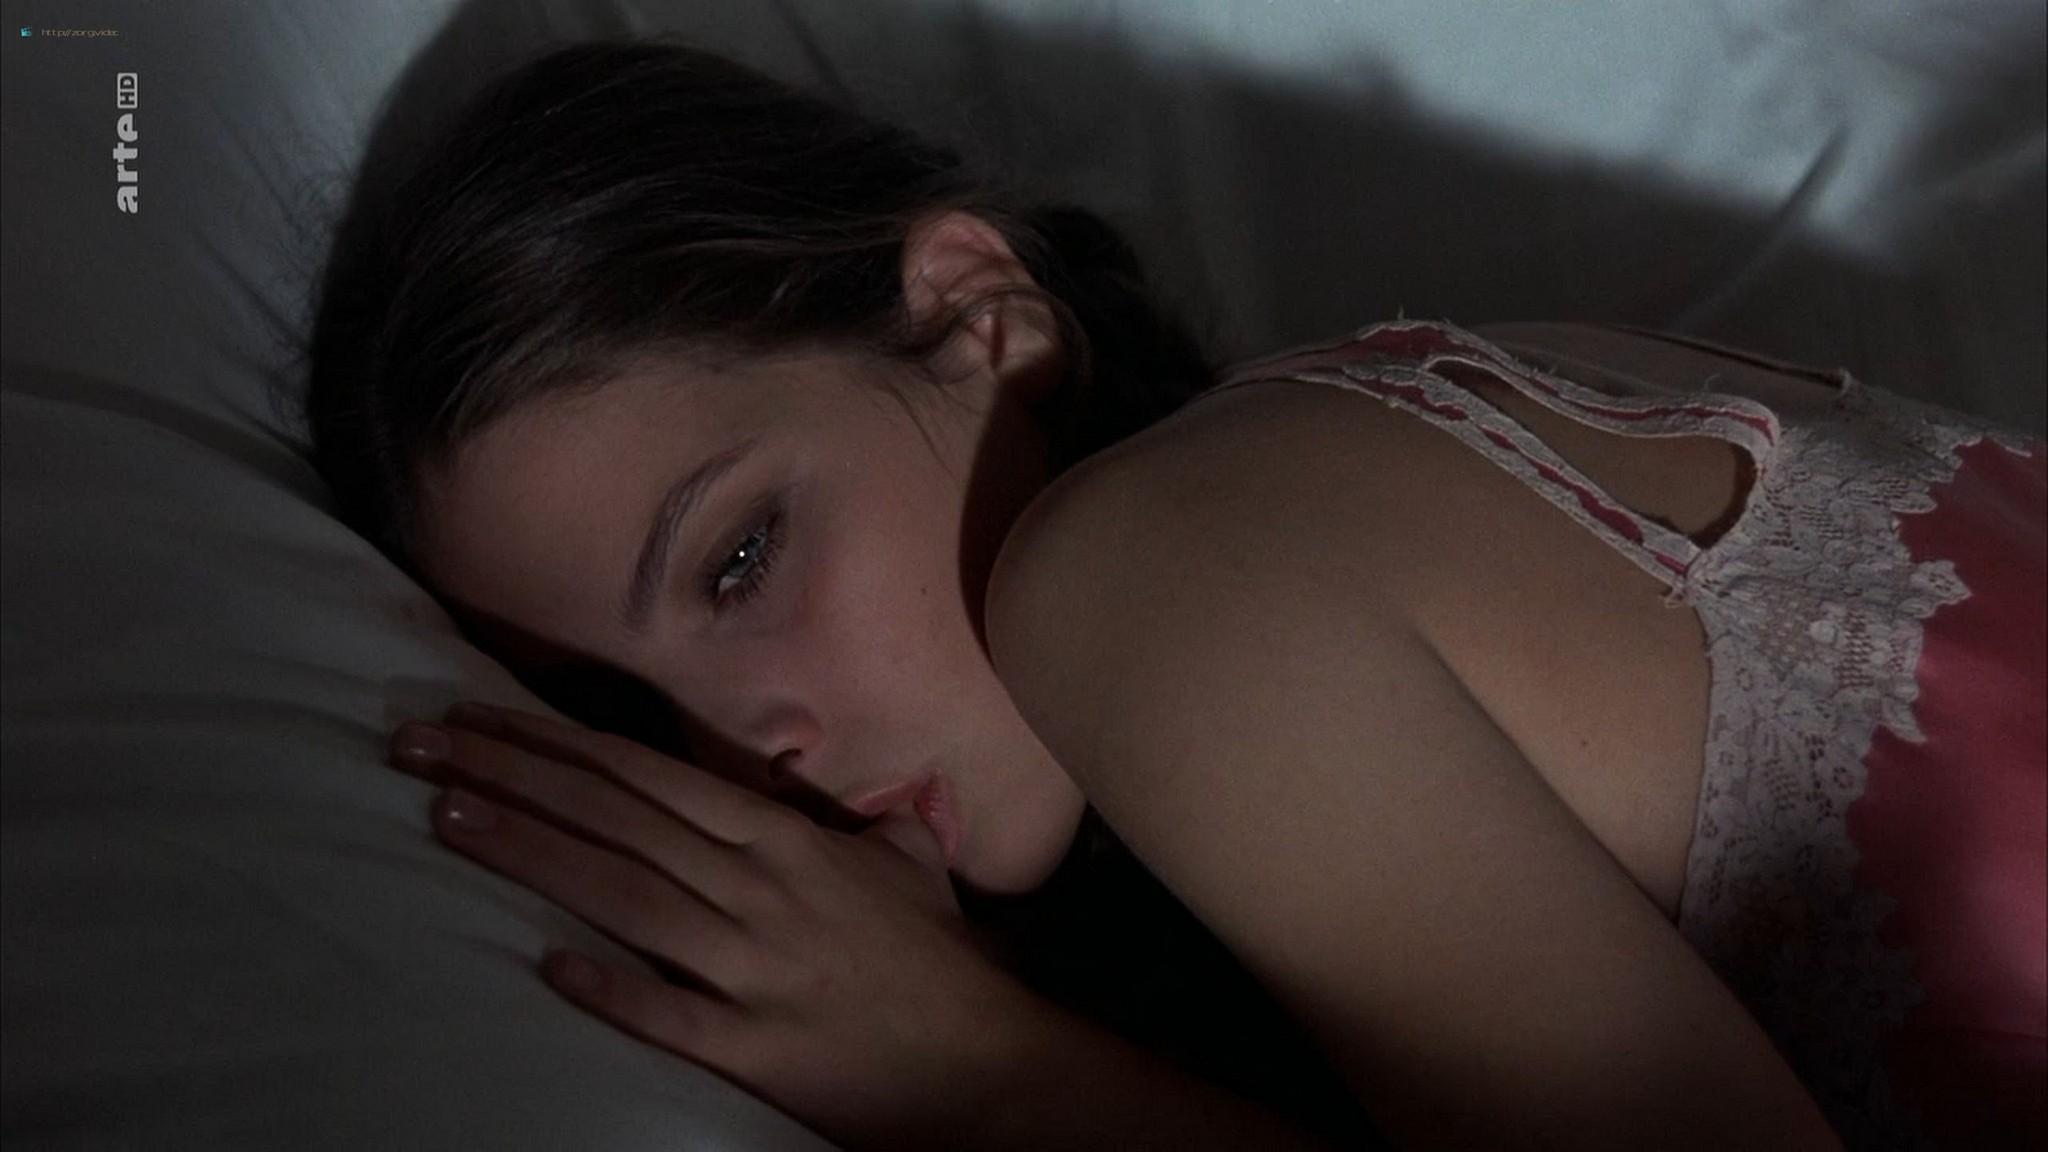 Ornella Muti nude full frontal - La dernière femme (1976) HDTV 1080p (2)